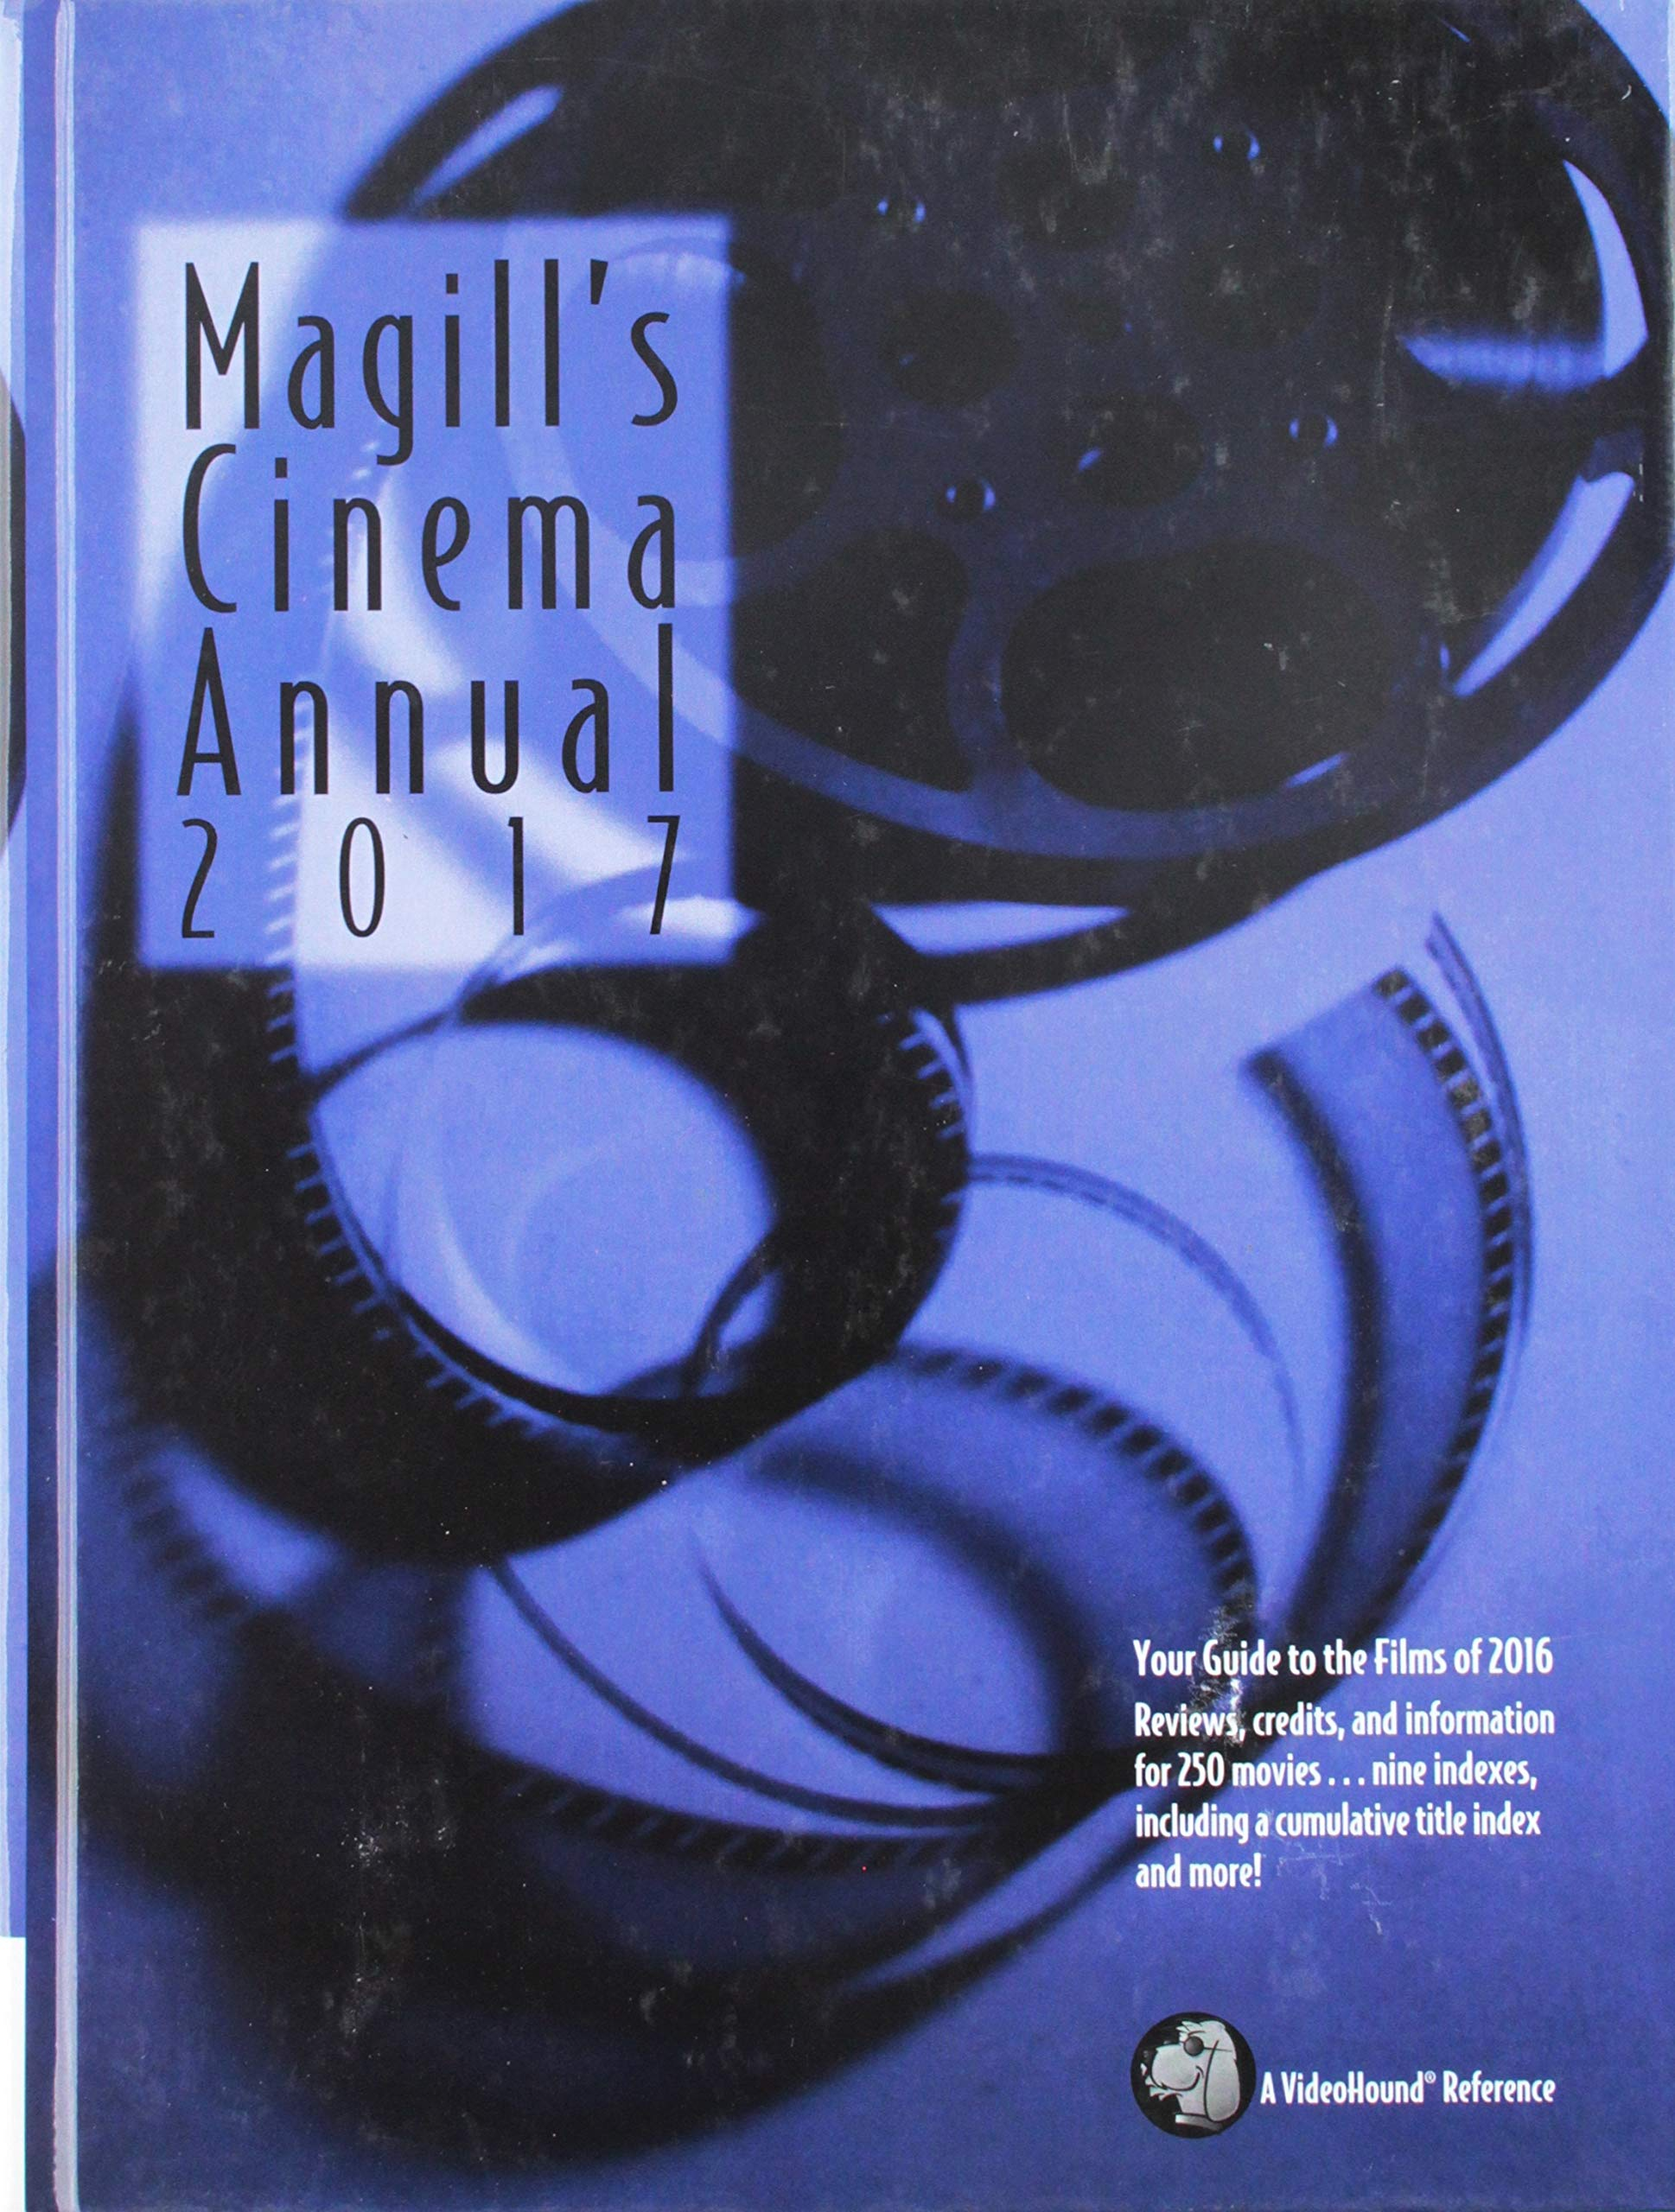 Magill's Cinema Annual Films